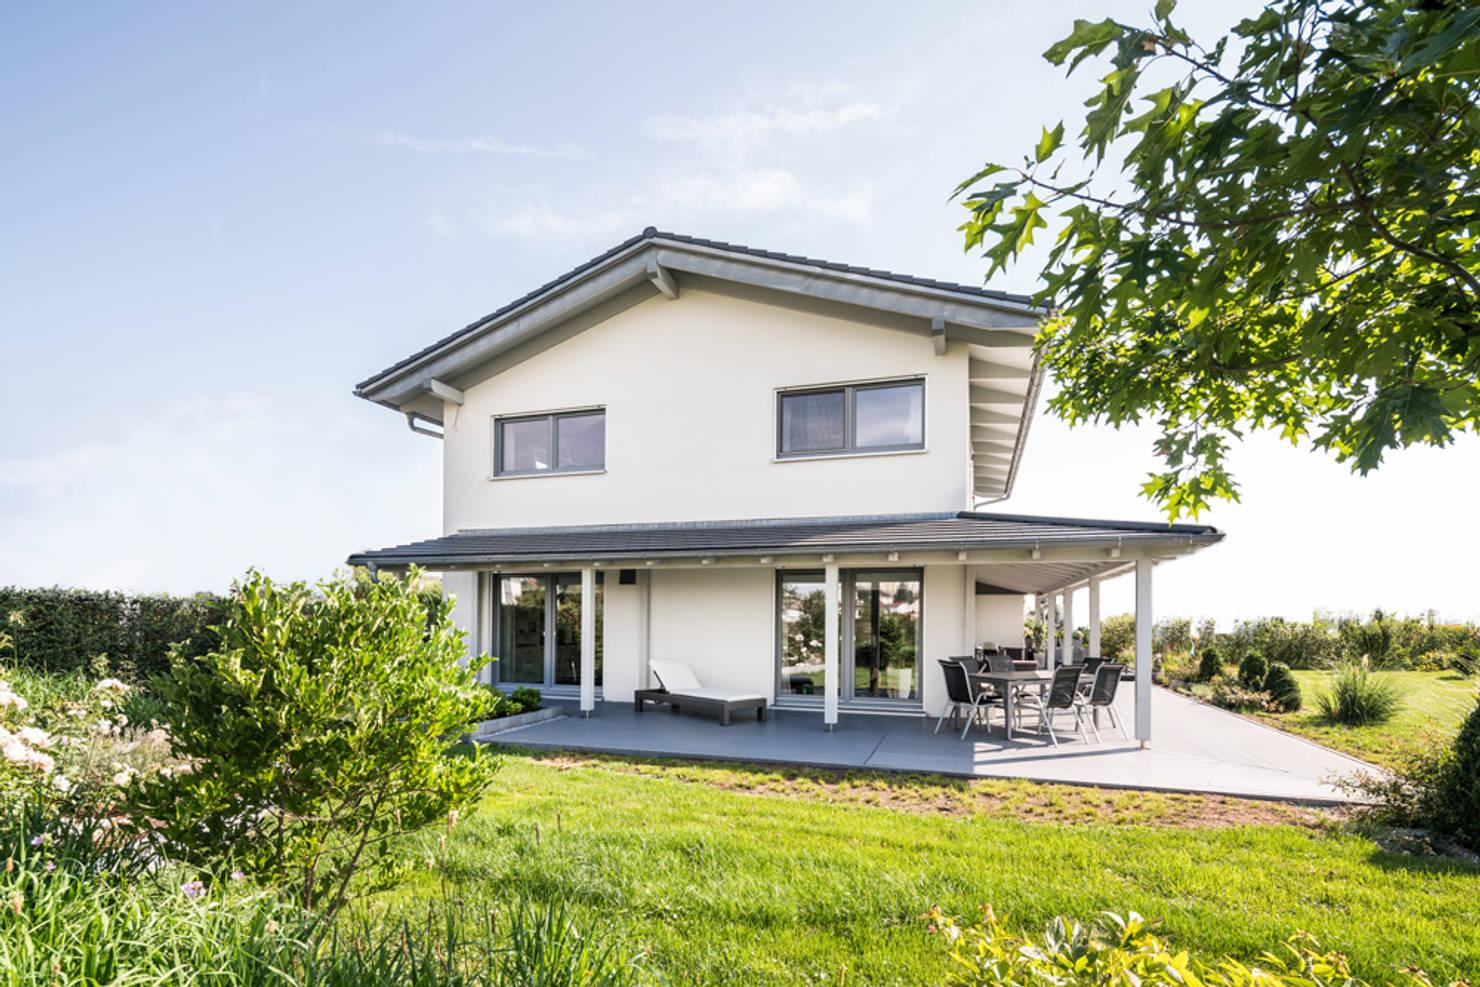 На фото - Немецкий дом за 4 млн рублей